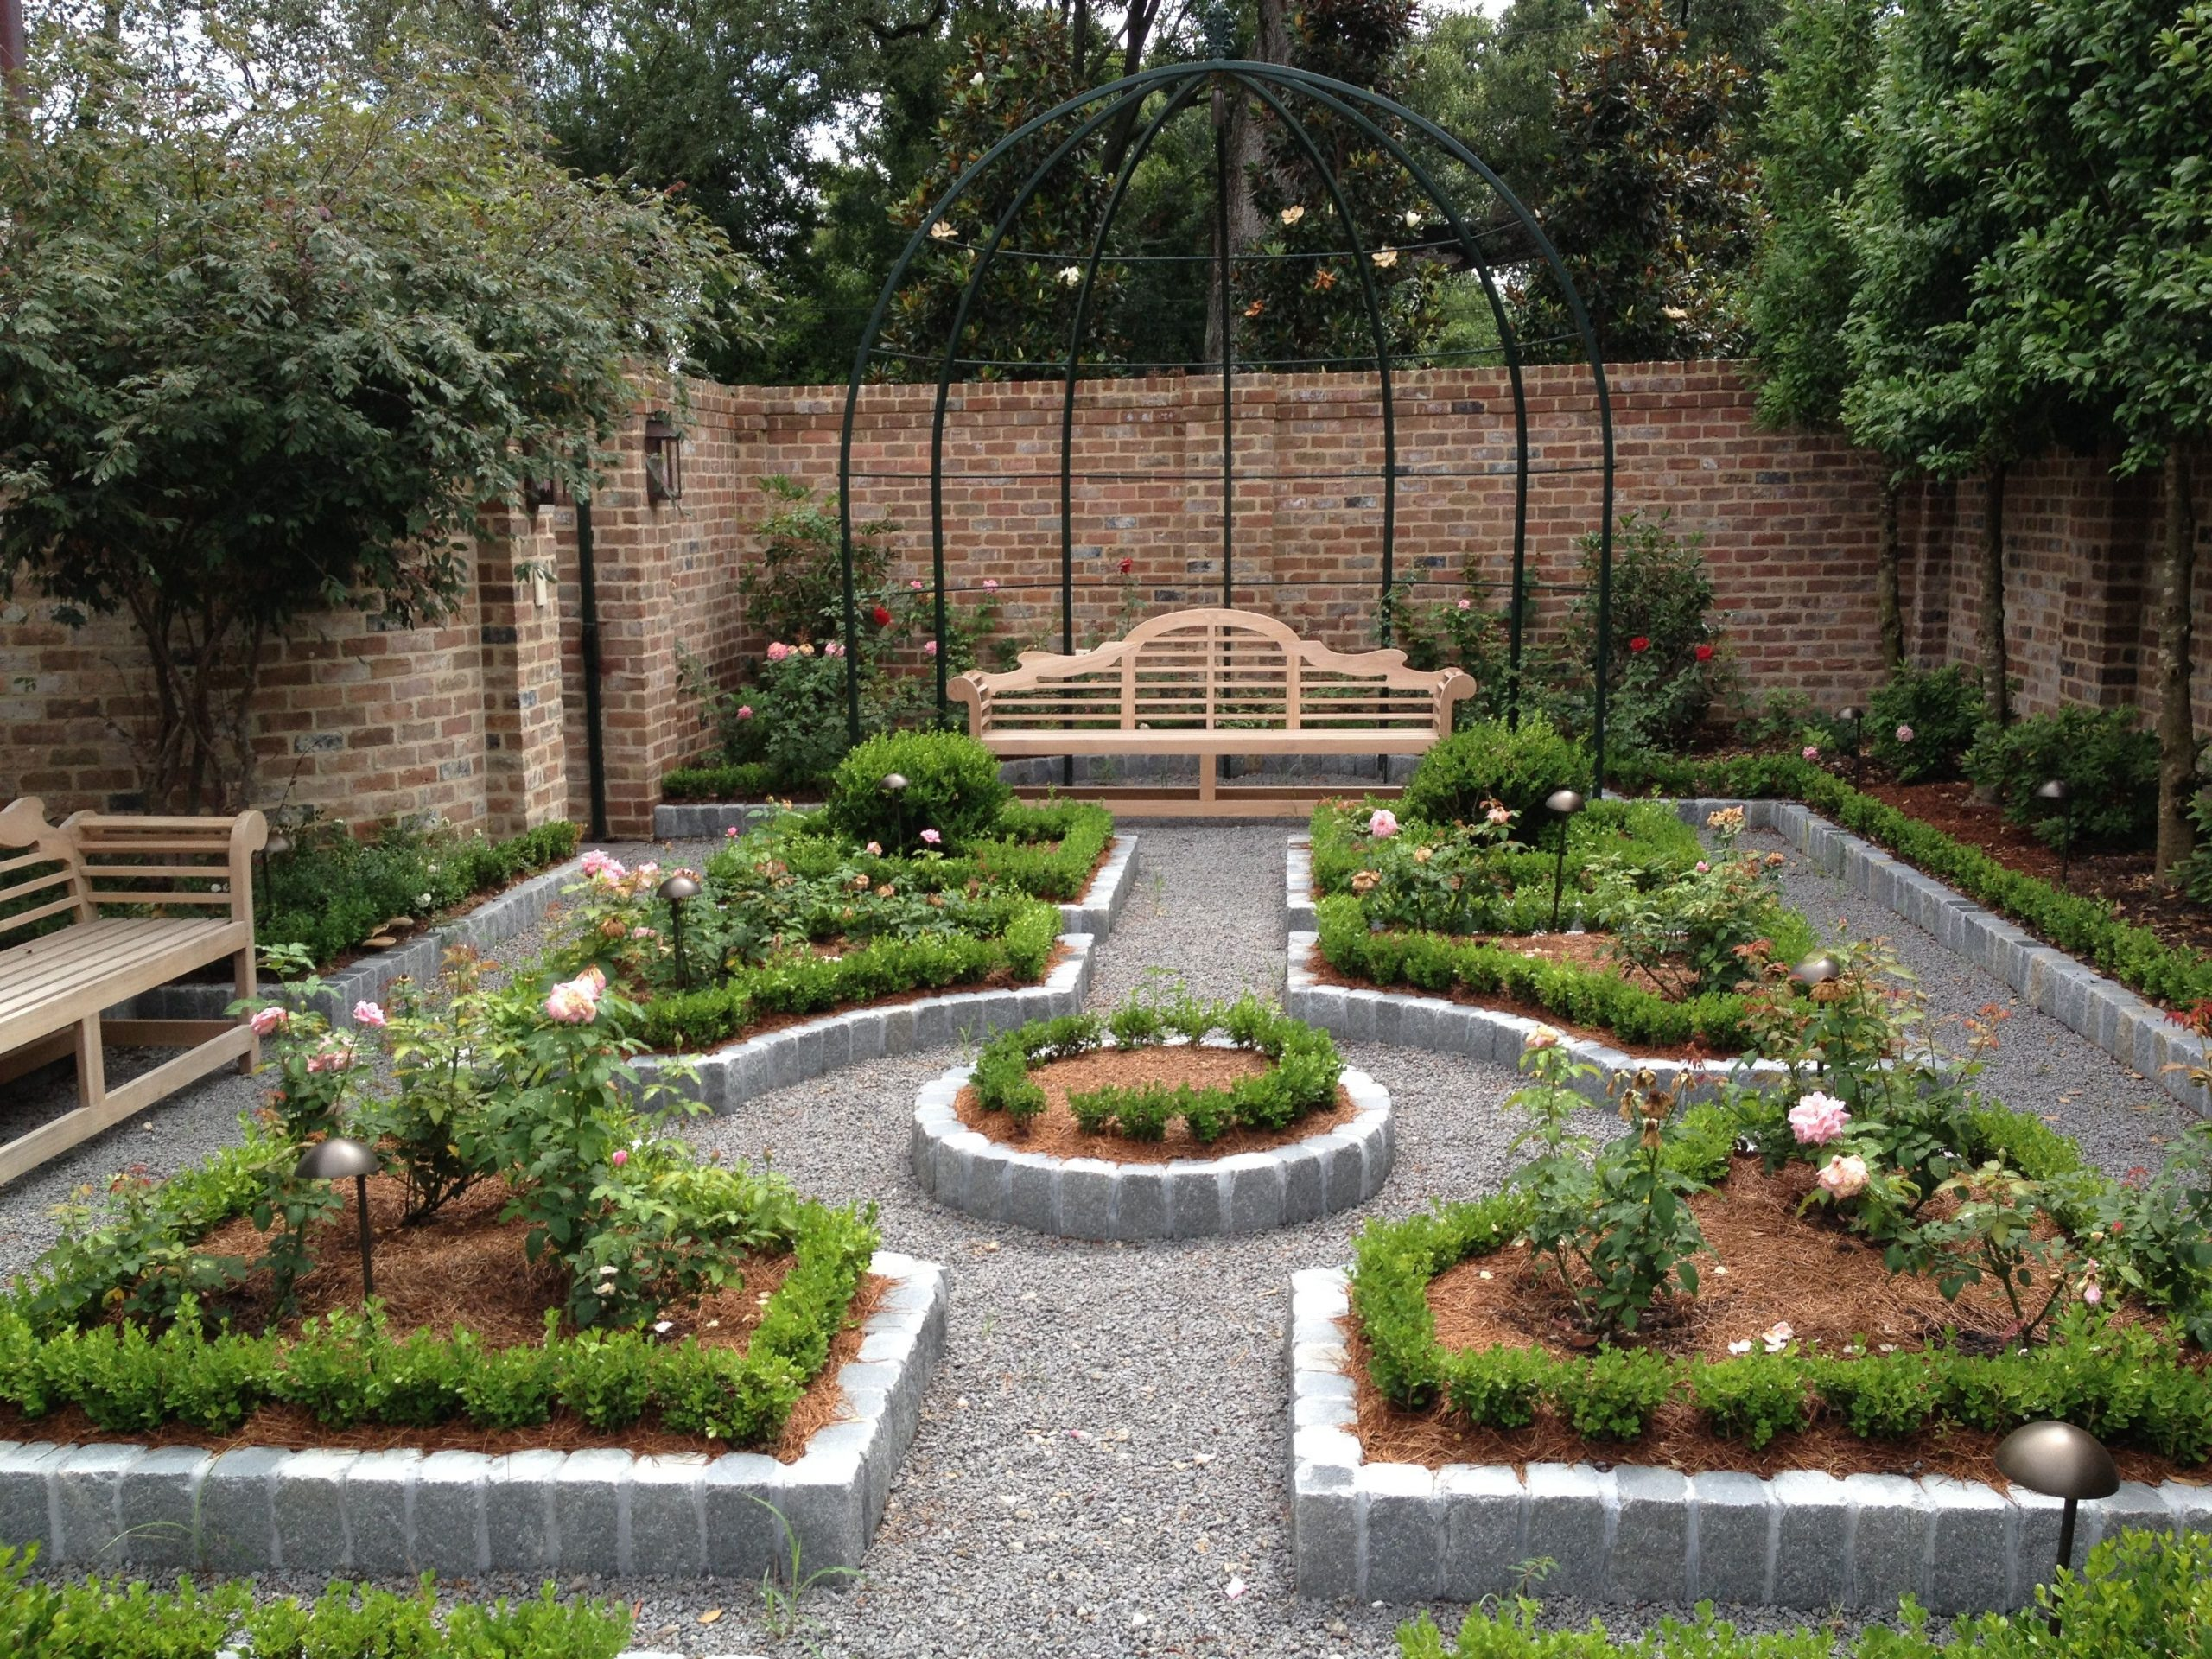 English Rose Garden Designs Home Design Idea Delightful Part 4 Ideas. hanging gardens of babylon. china garden menu. descanso gardens. chihuly garden and glass. -   22 victorian courtyard garden ideas